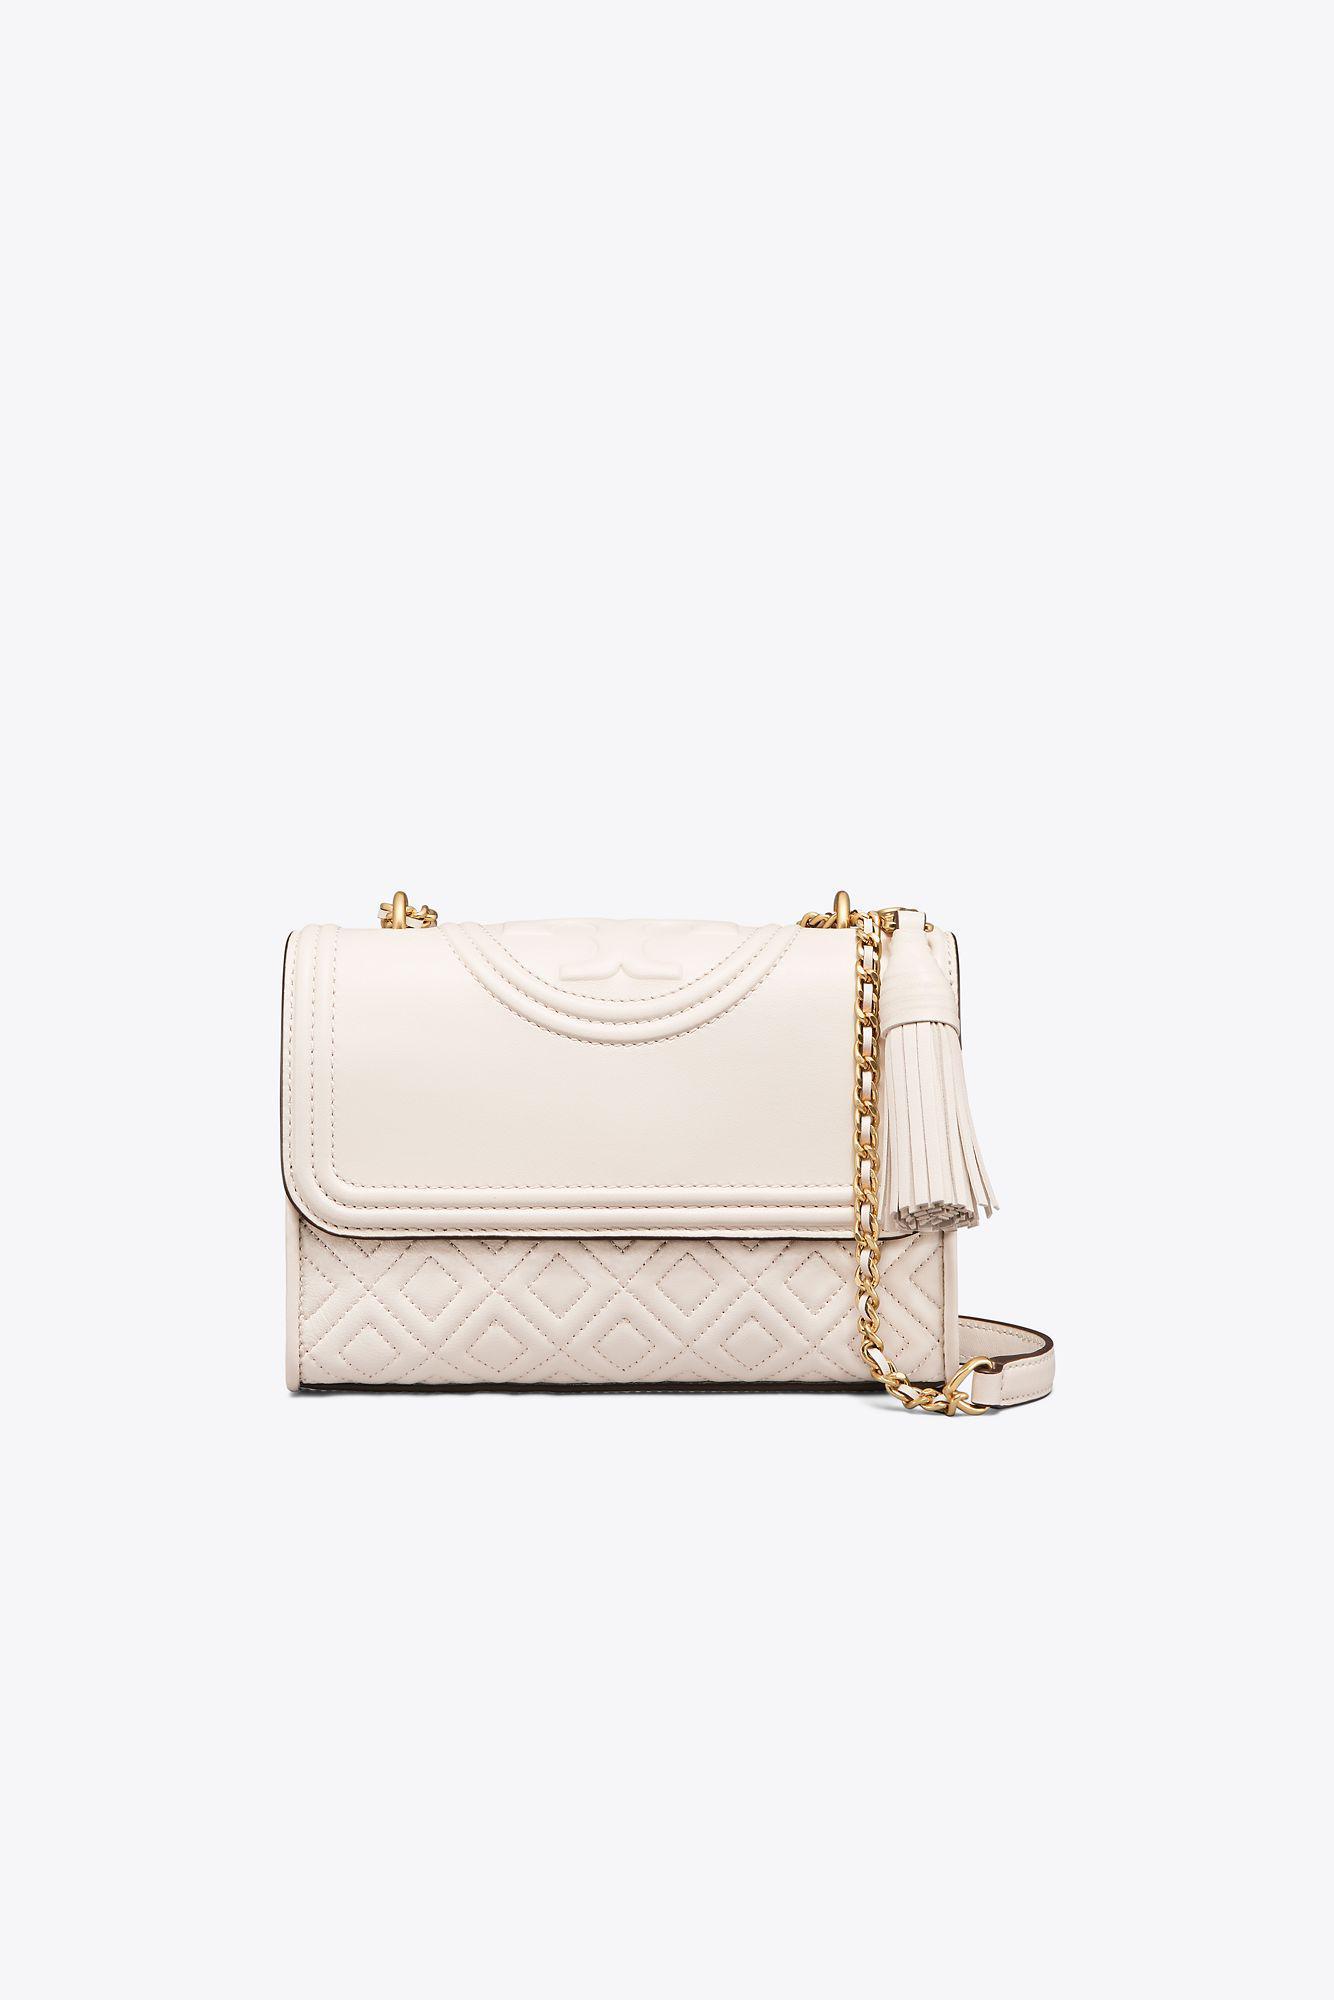 716a17b17840 Lyst - Tory Burch Fleming Convertible Shoulder Bag - Save 31%